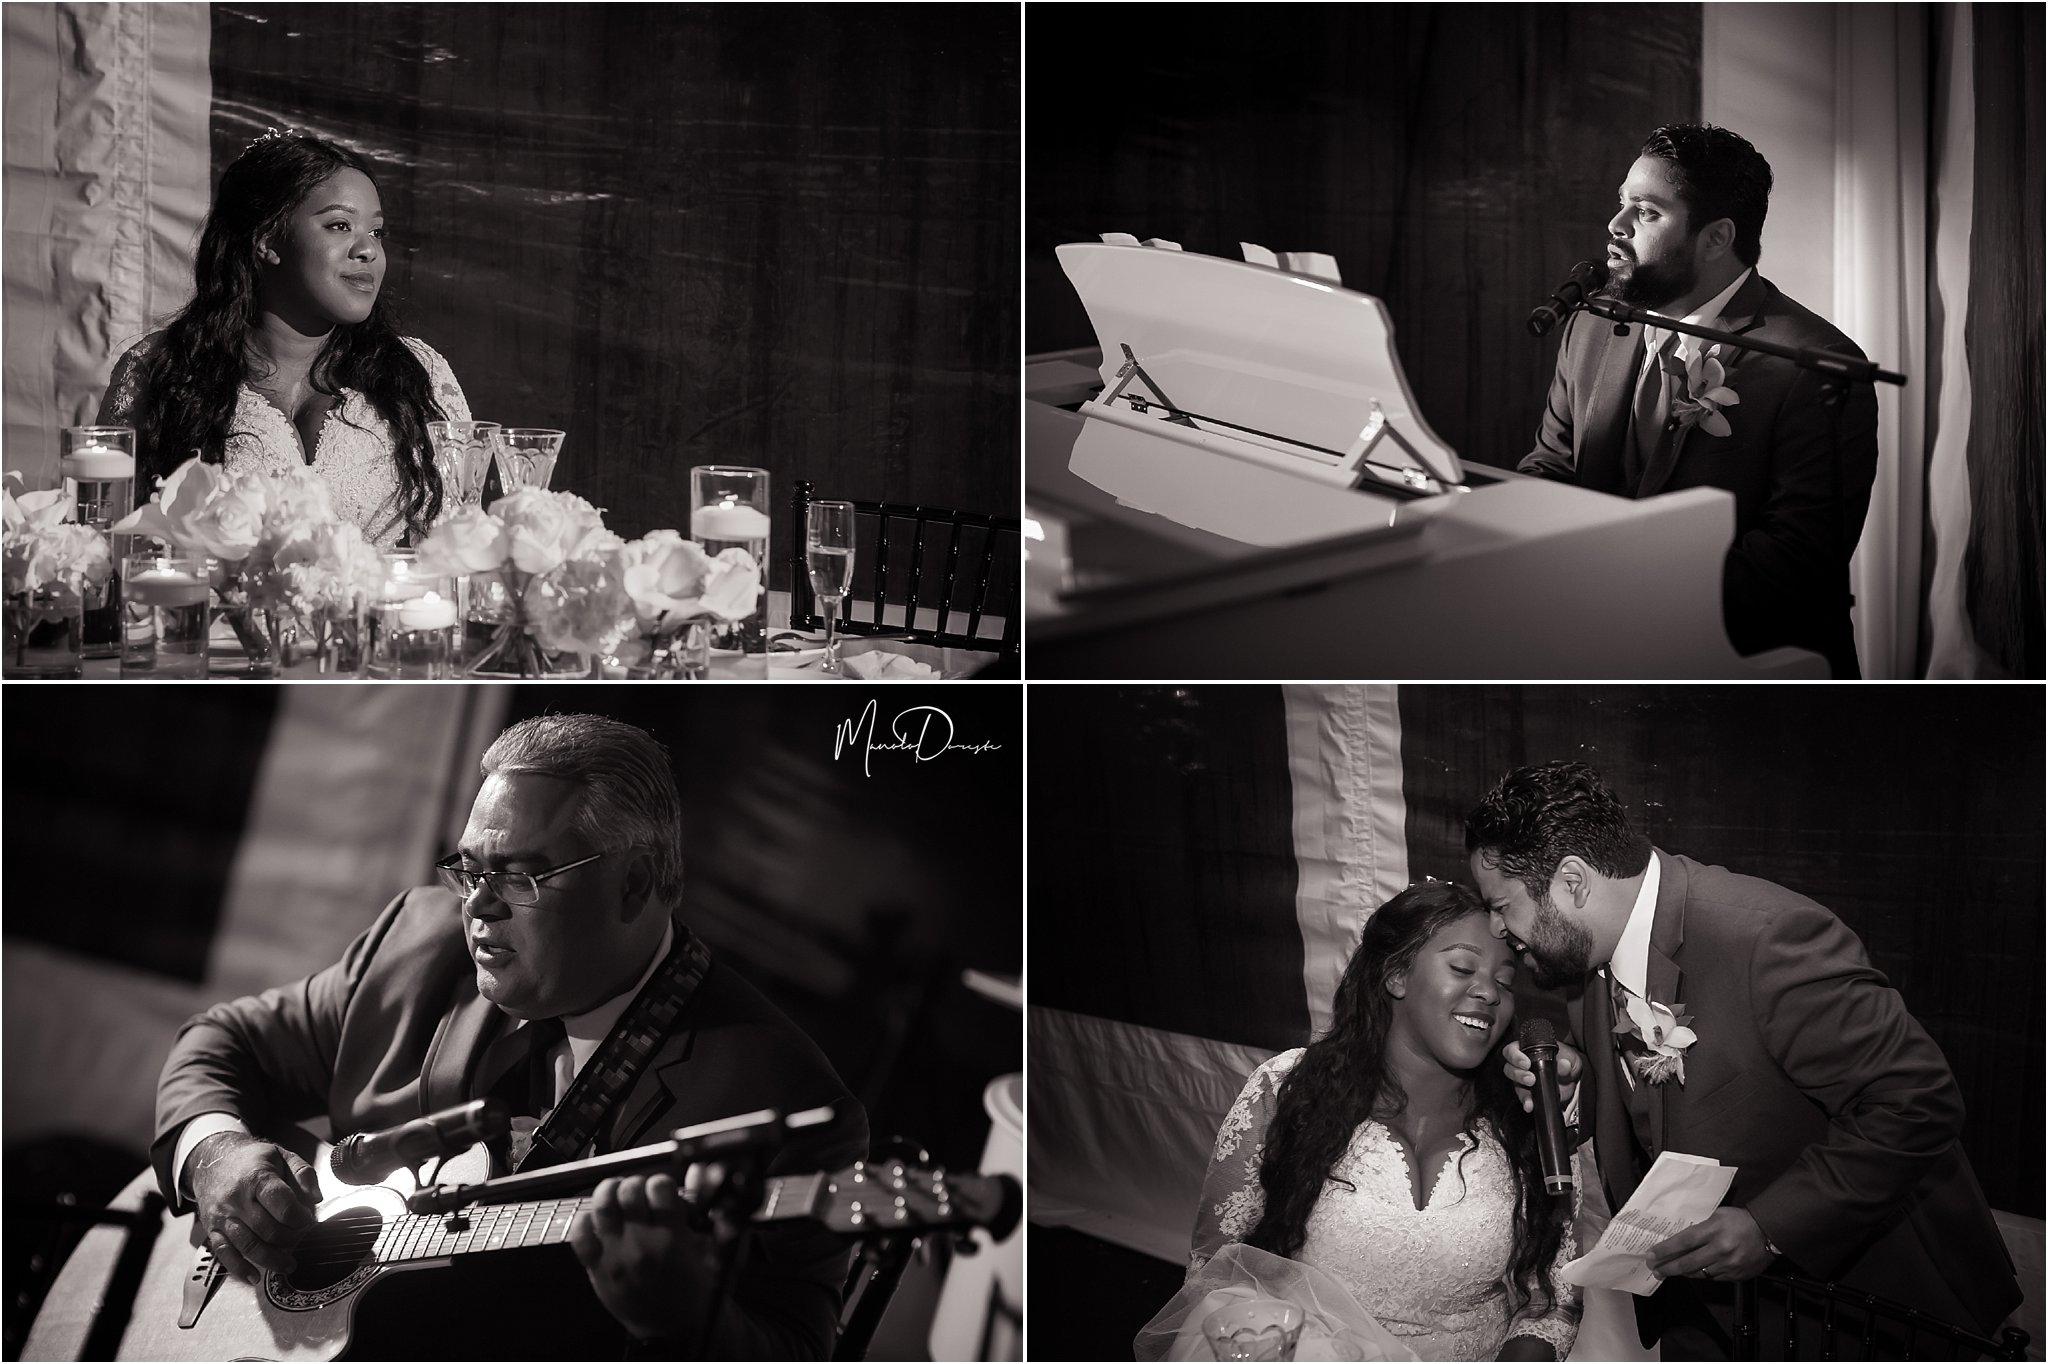 0431_ManoloDoreste_InFocusStudios_Wedding_Family_Photography_Miami_MiamiPhotographer.jpg